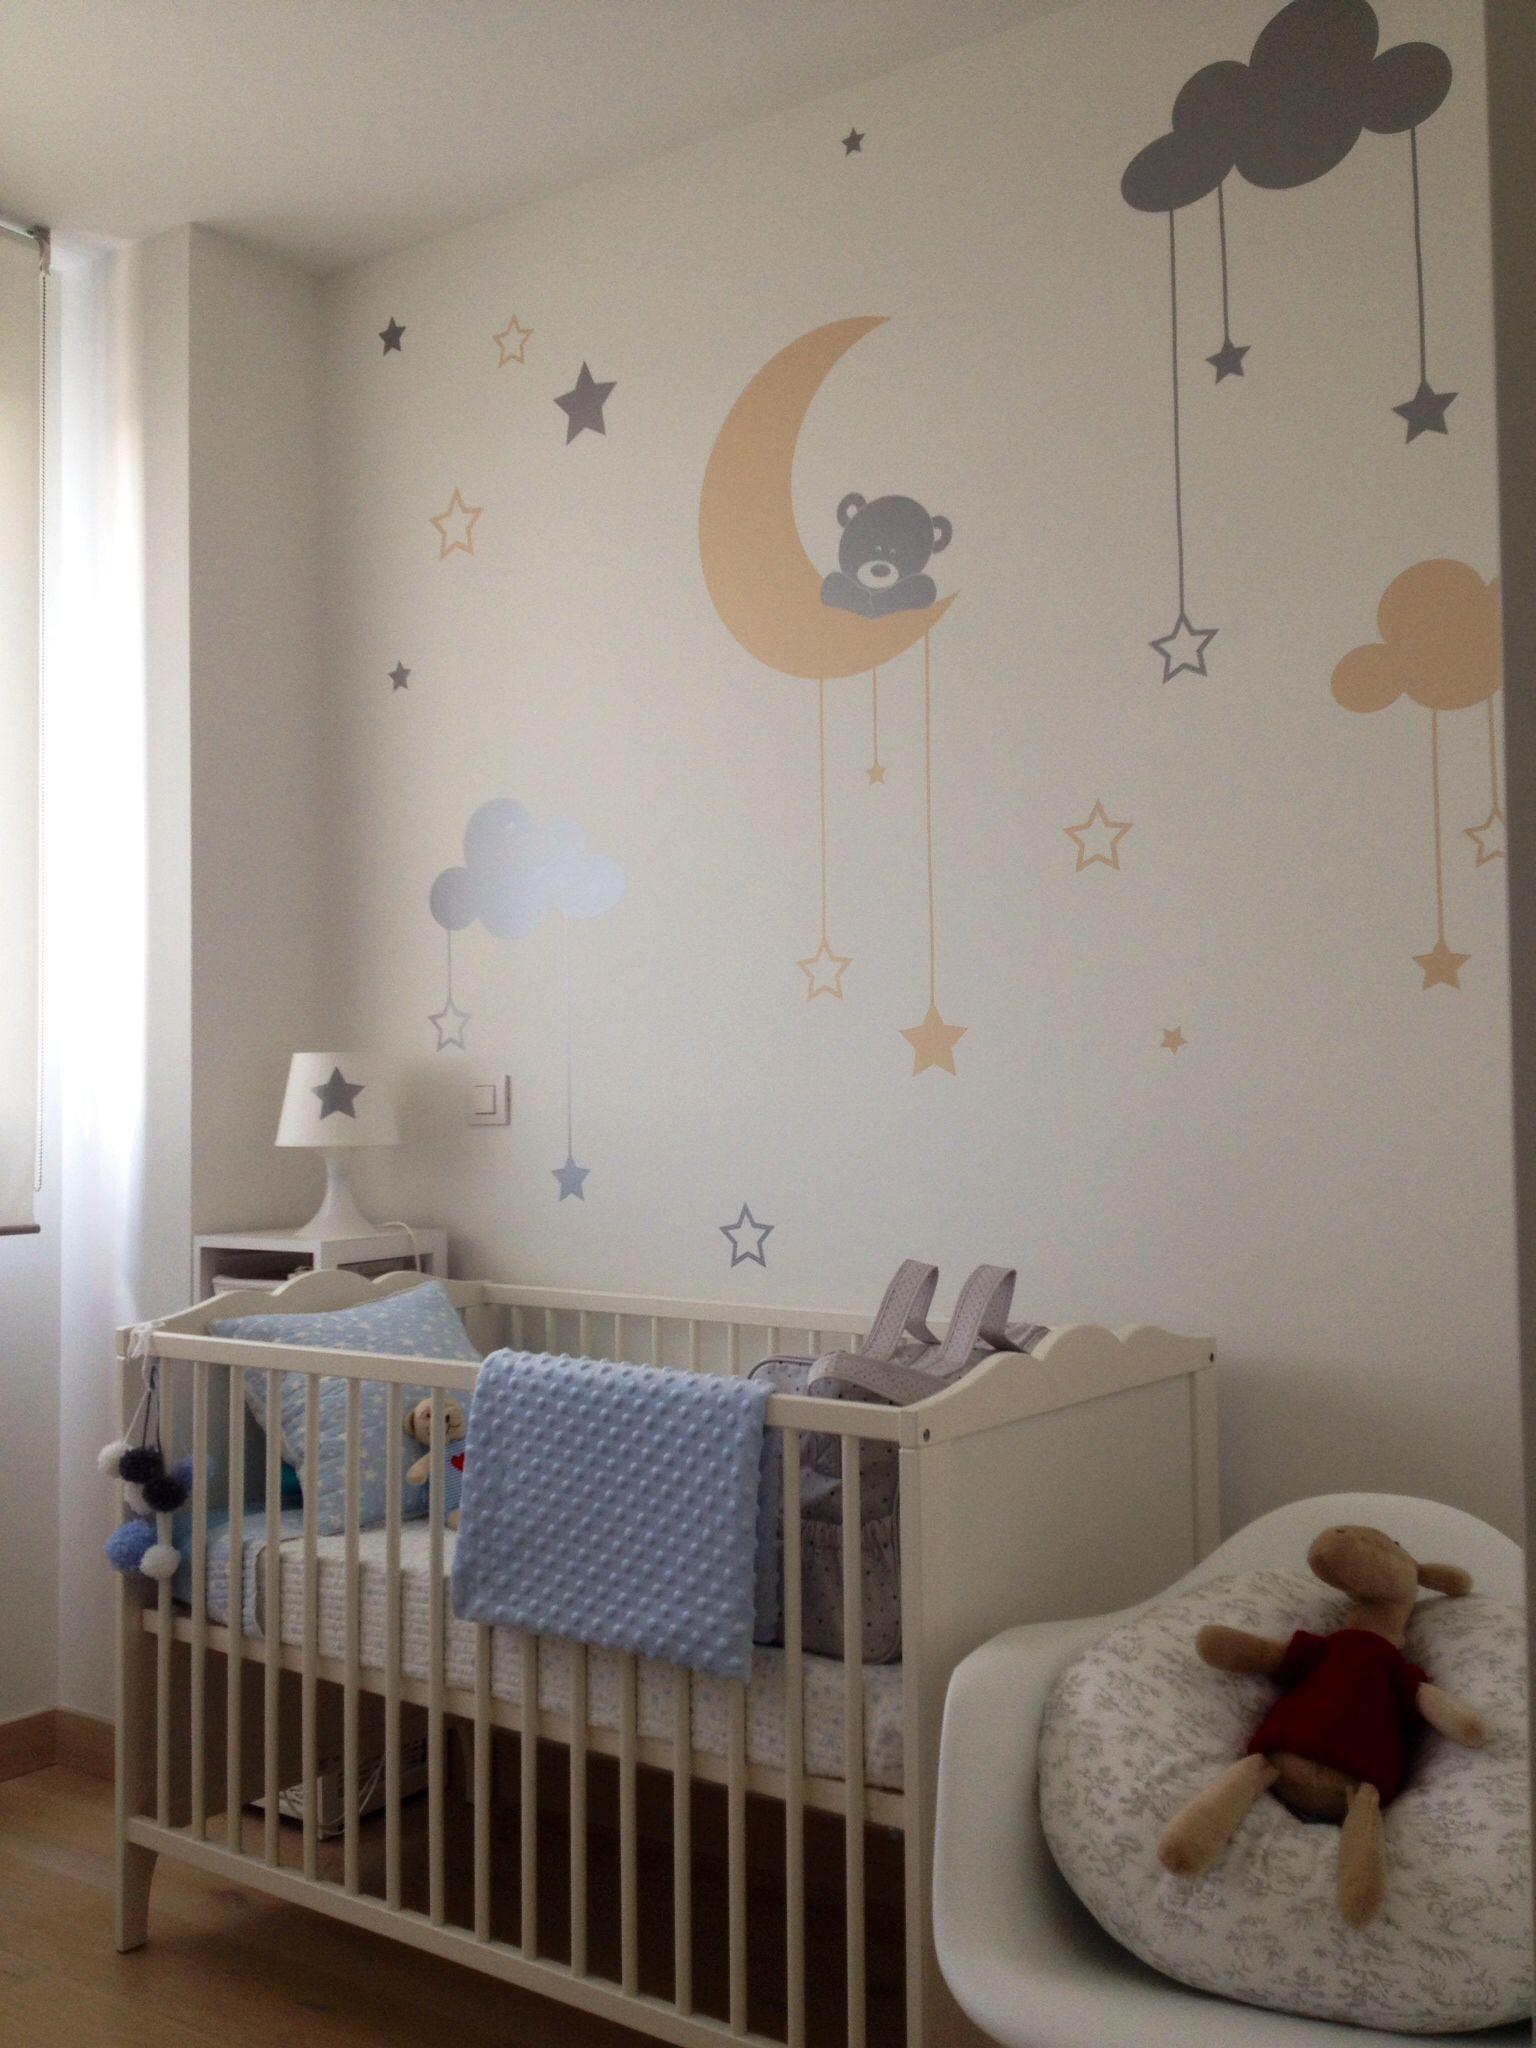 Vinilo infantil moon bear de myvinilo nursery ideas for Decoracion pared bebe nino